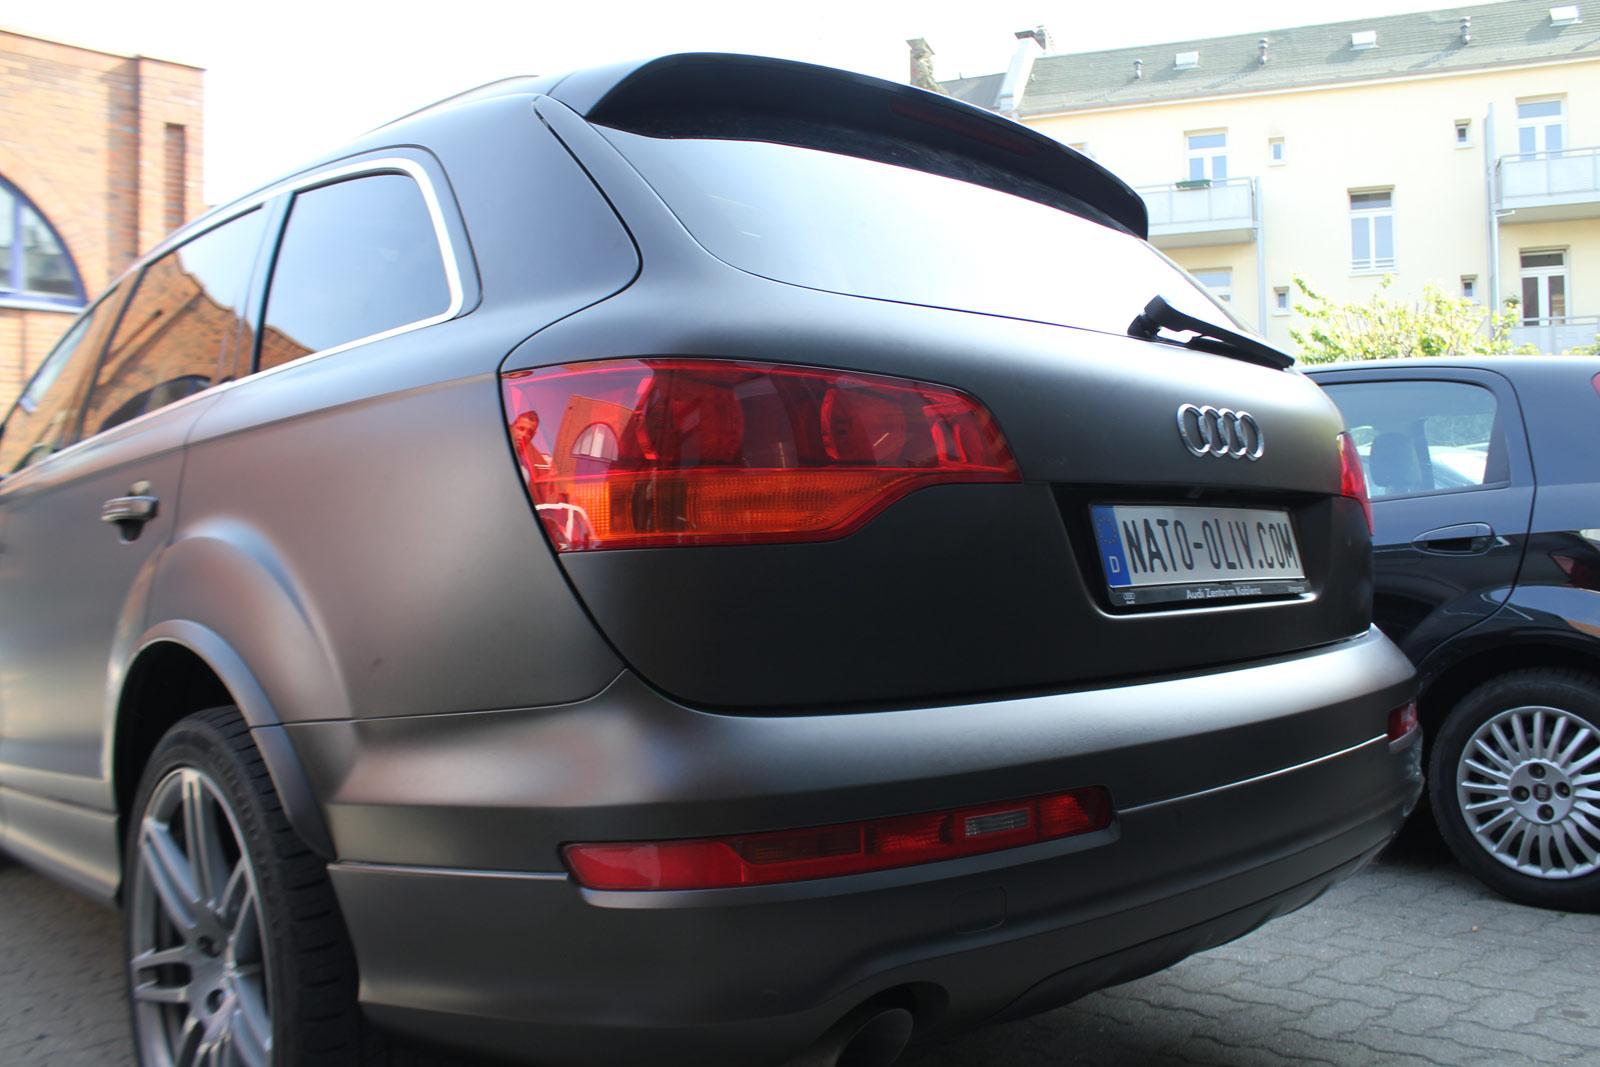 Audi_Q7_Folierung_Braun_Matt_Metallic_21